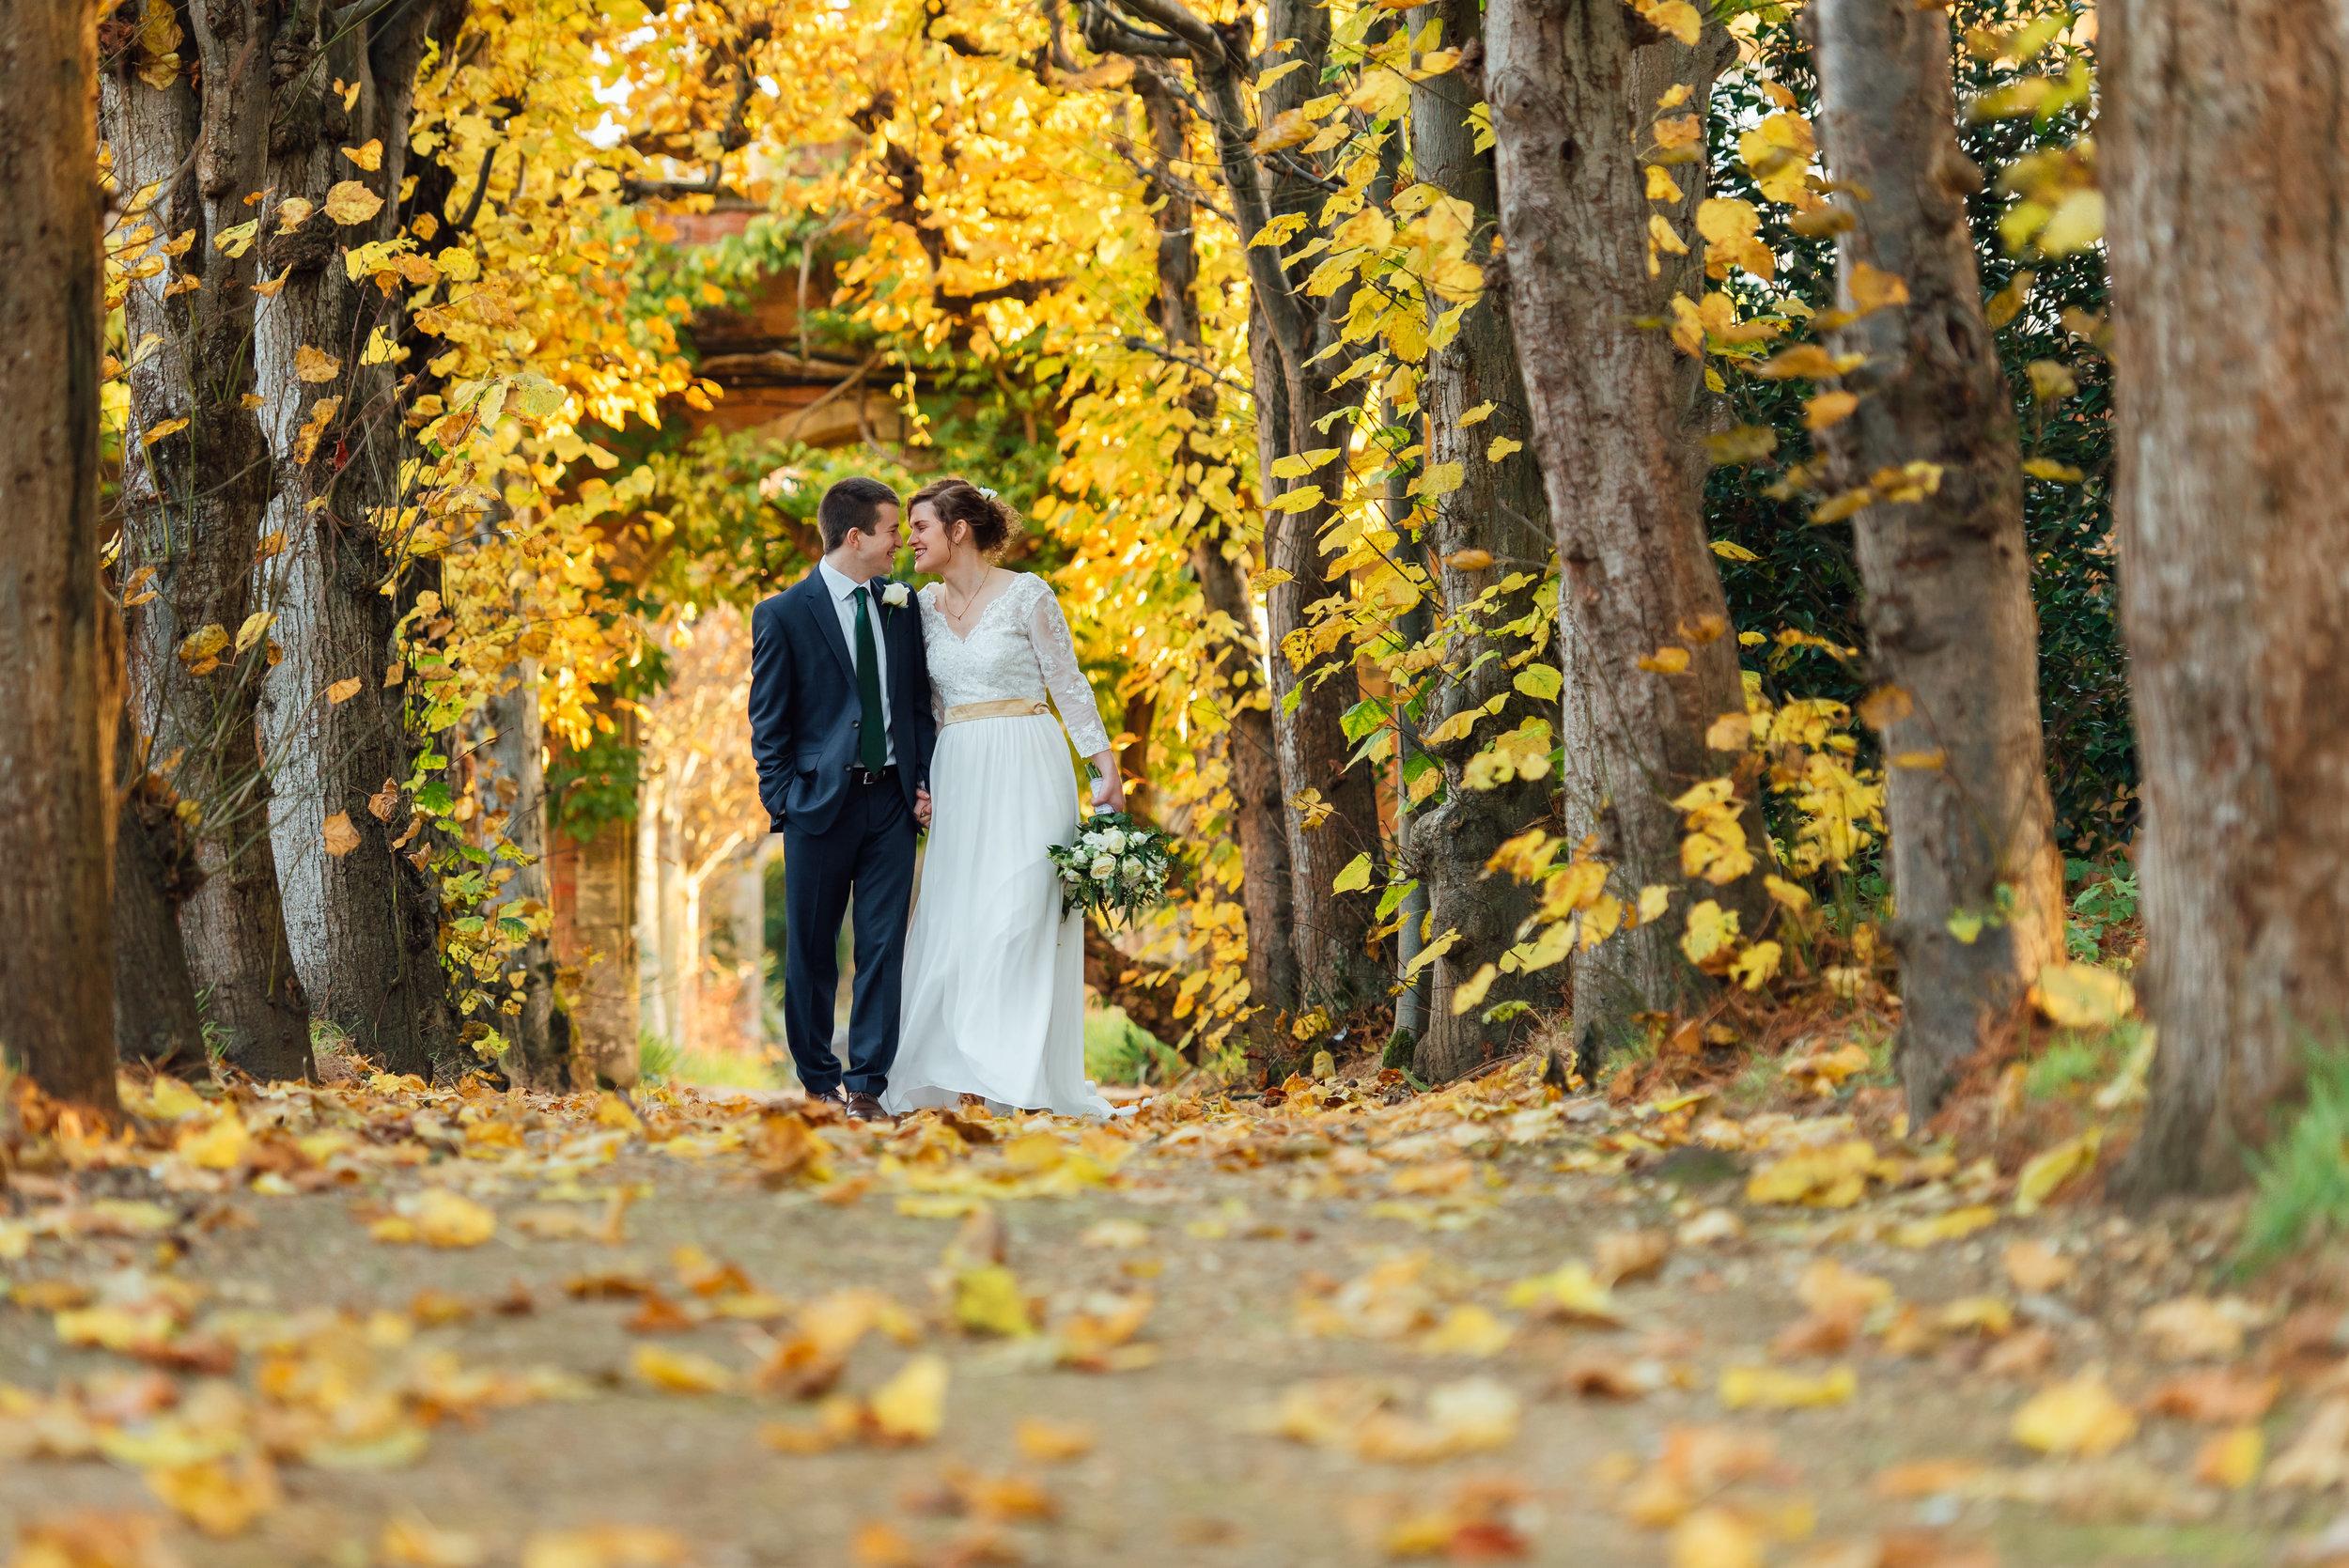 Hampshire-wedding-photographer-hampshire : Amy-James-Photography : Tylney-Hall-Wedding : Tyleny-Hall-Wedding-Photographer : Hampshire-wedding-venue : Fleet-wedding-photographer-farnborough-511.jpg